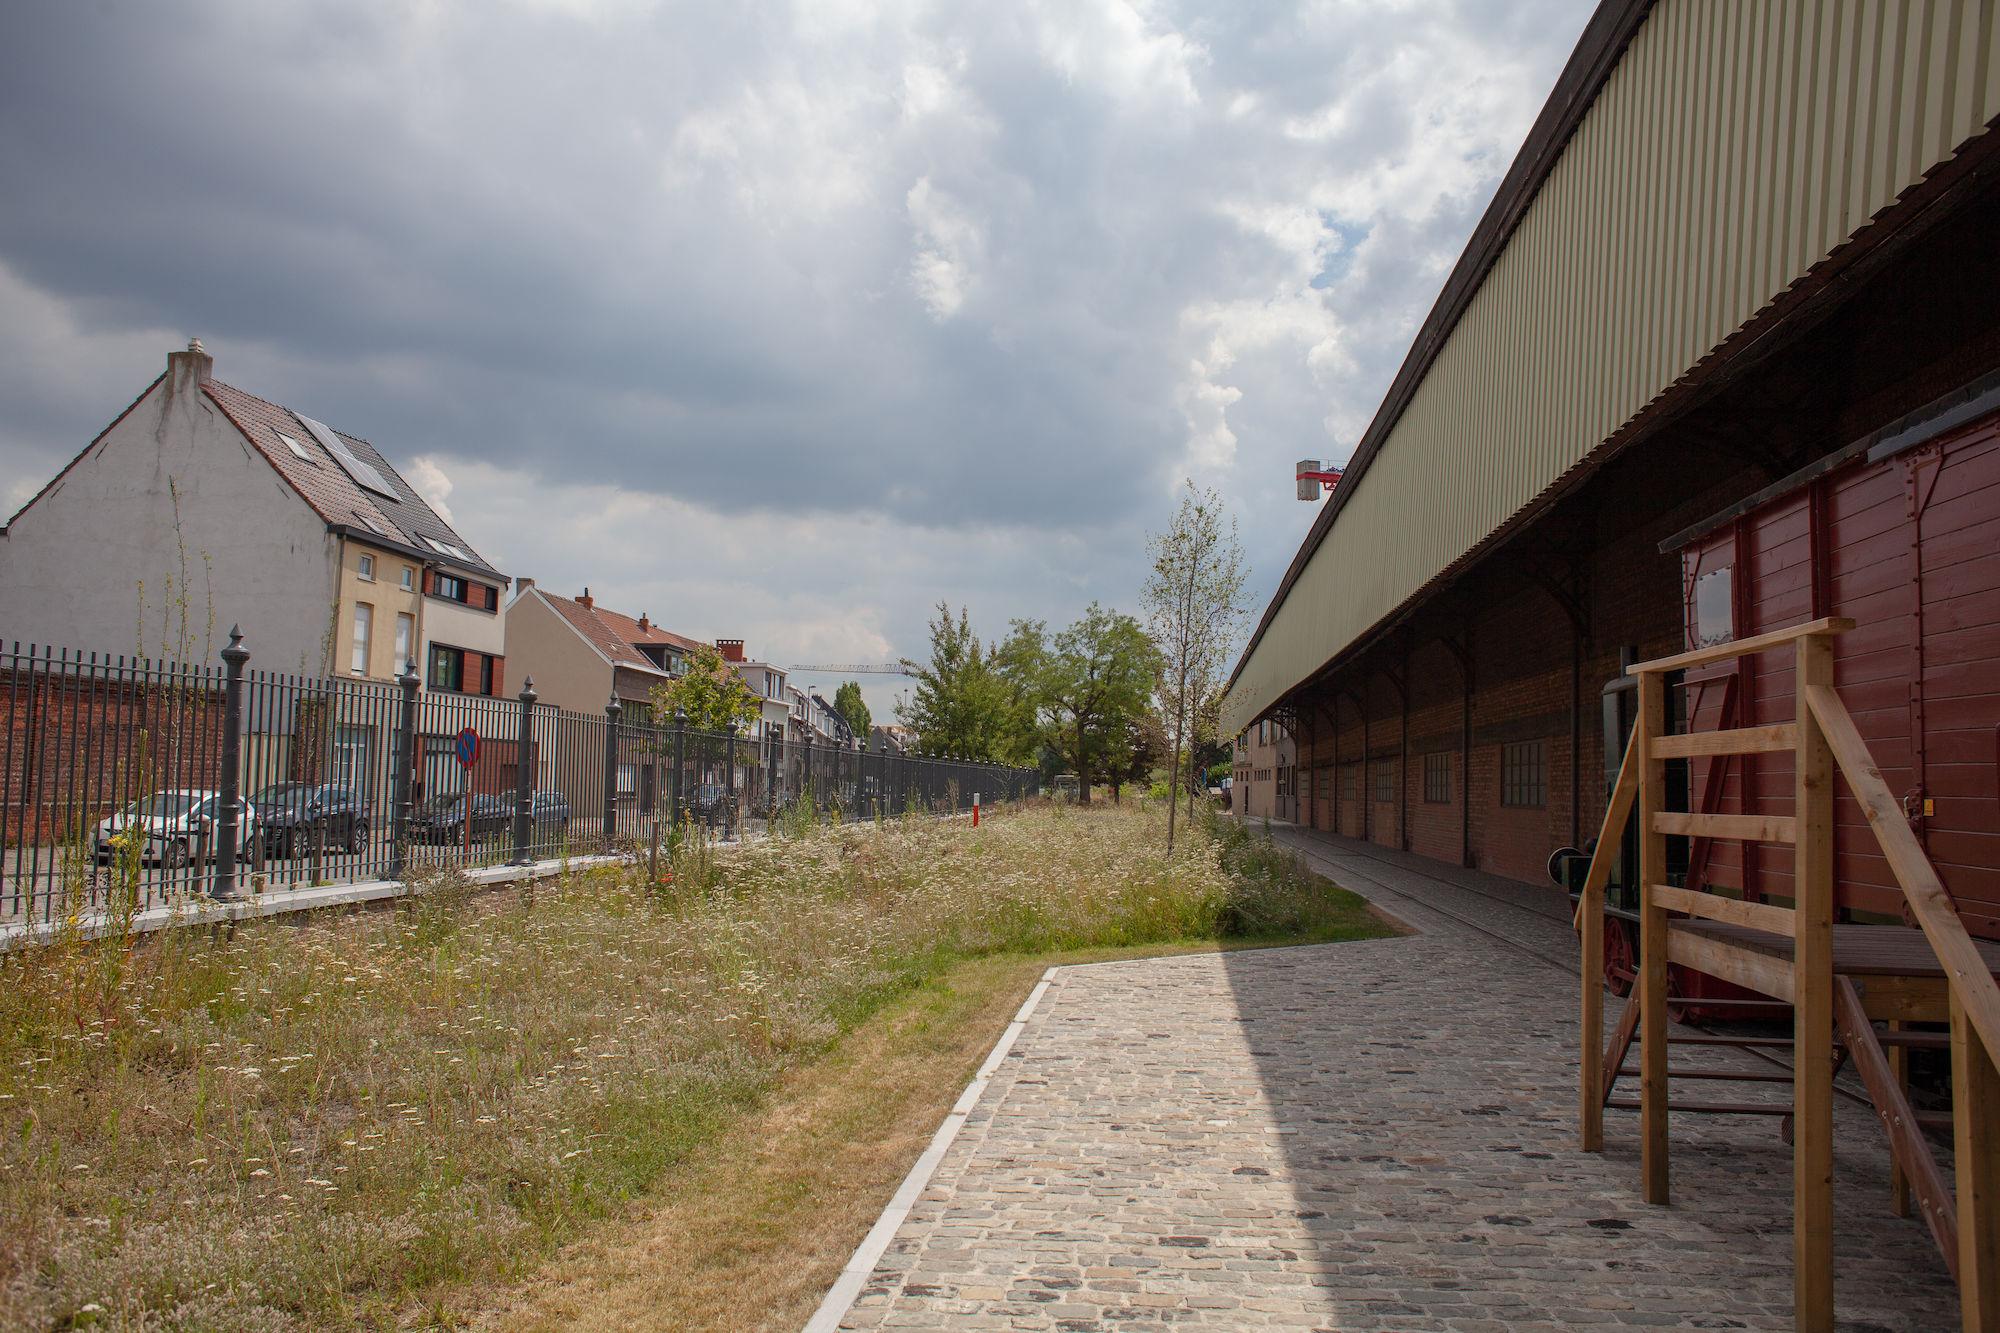 2019-07-02 Muide Meulestede prospectie Wannes_stadsvernieuwing_IMG_0397-3.jpg